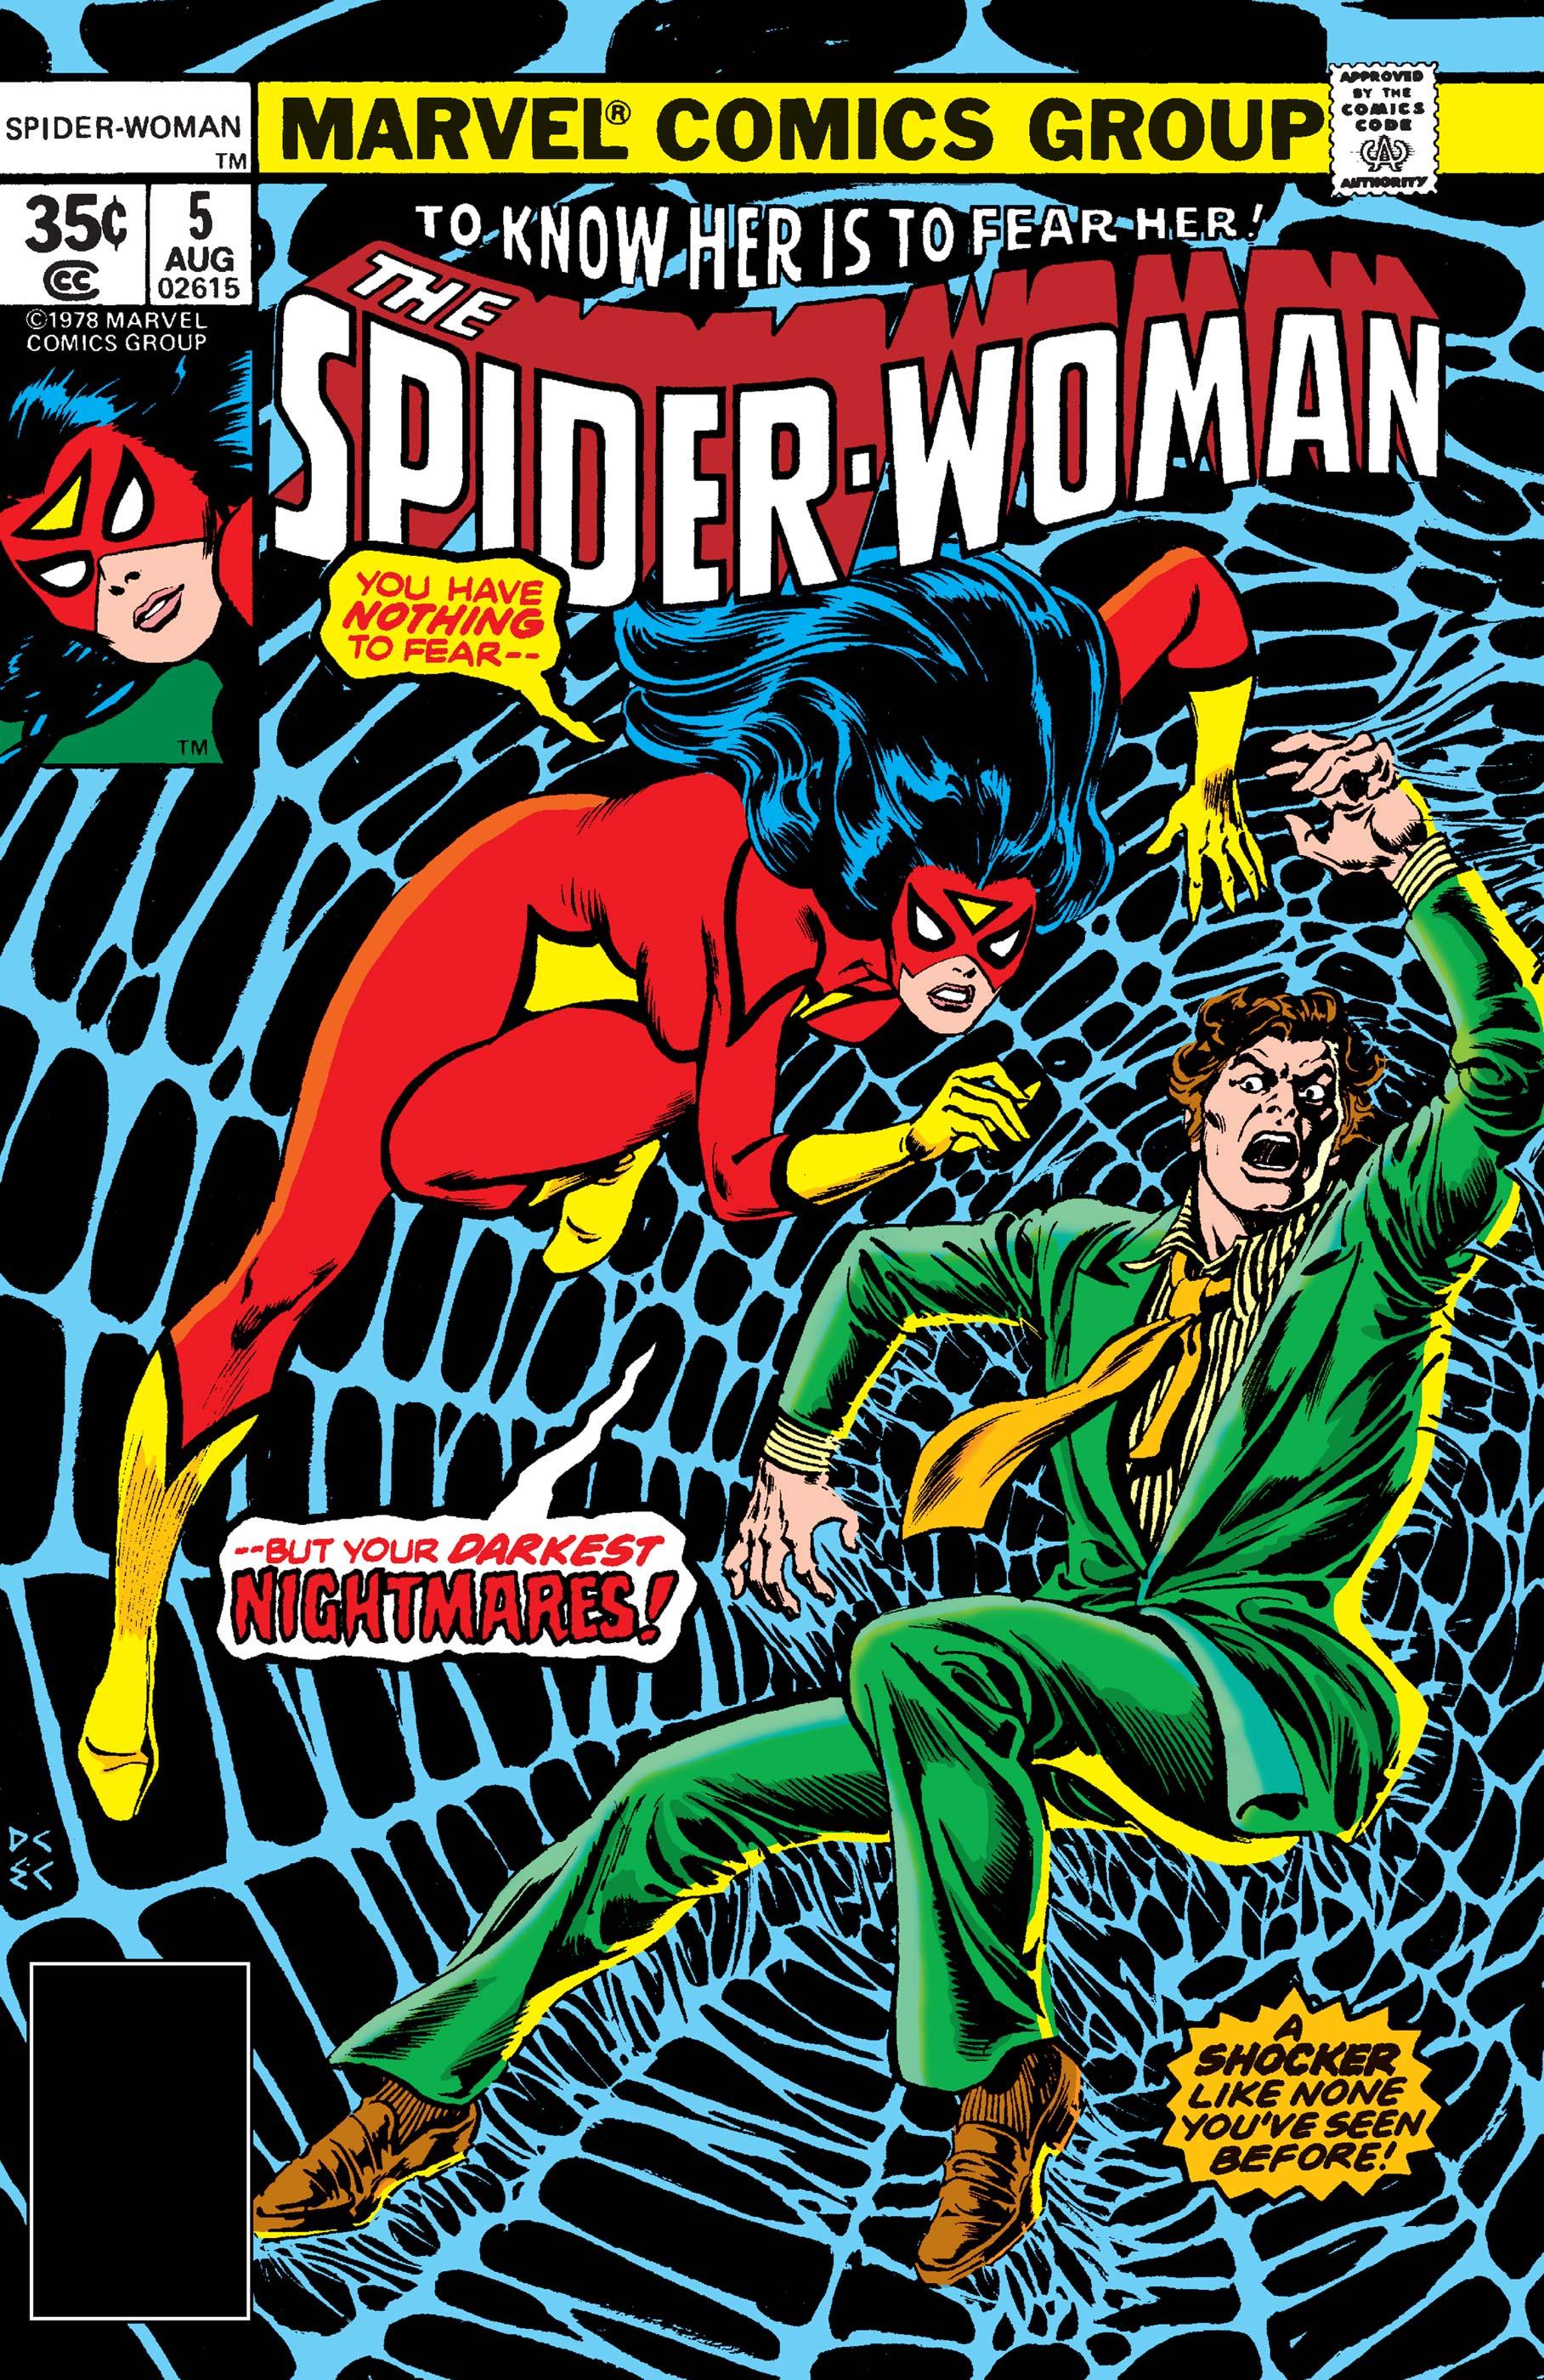 Spider-Woman (1978) #5